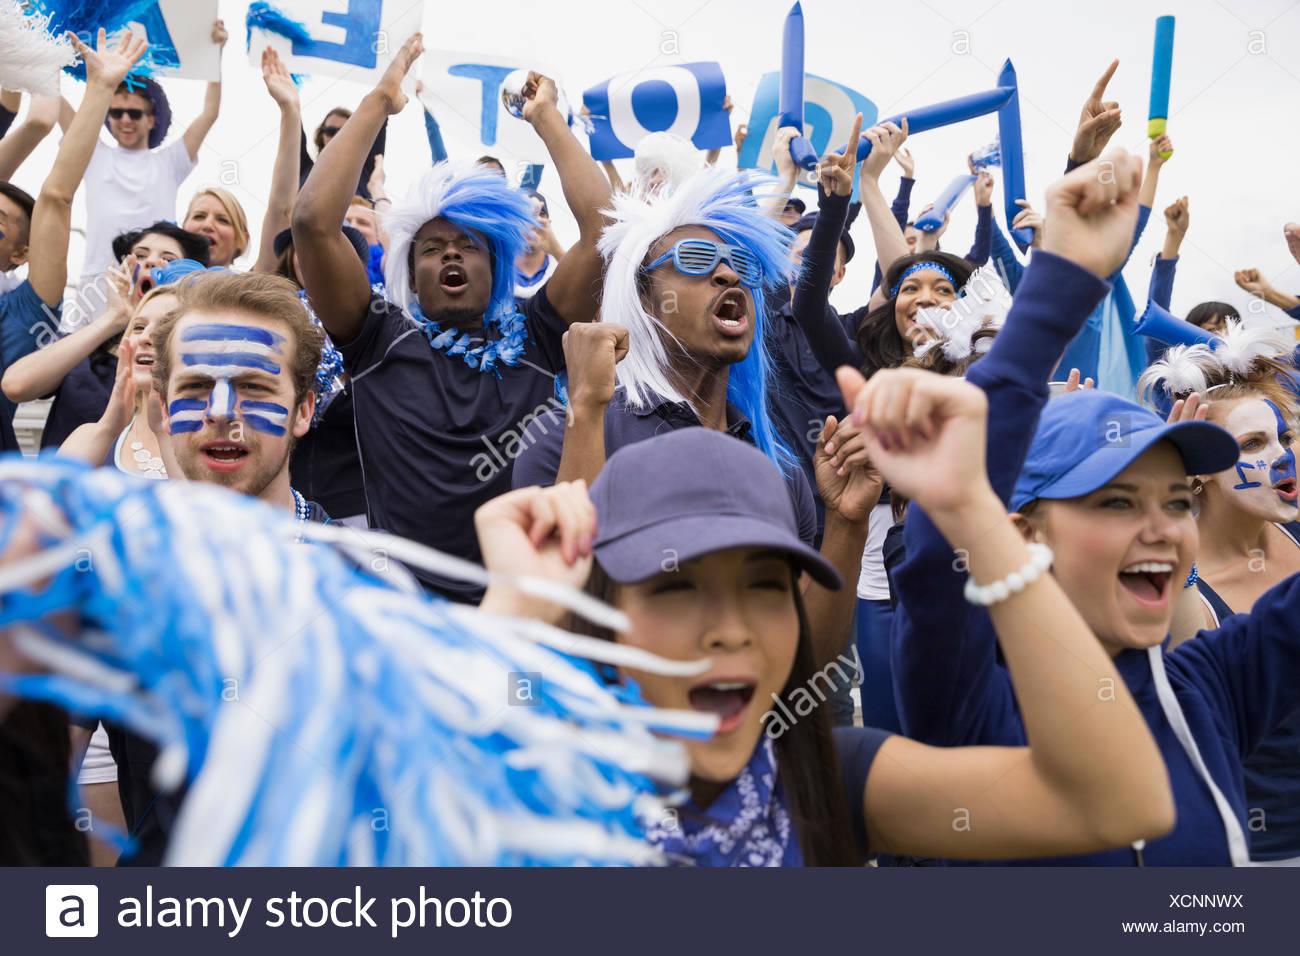 Muchedumbre entusiasta en azul vitoreando en evento deportivo Imagen De Stock